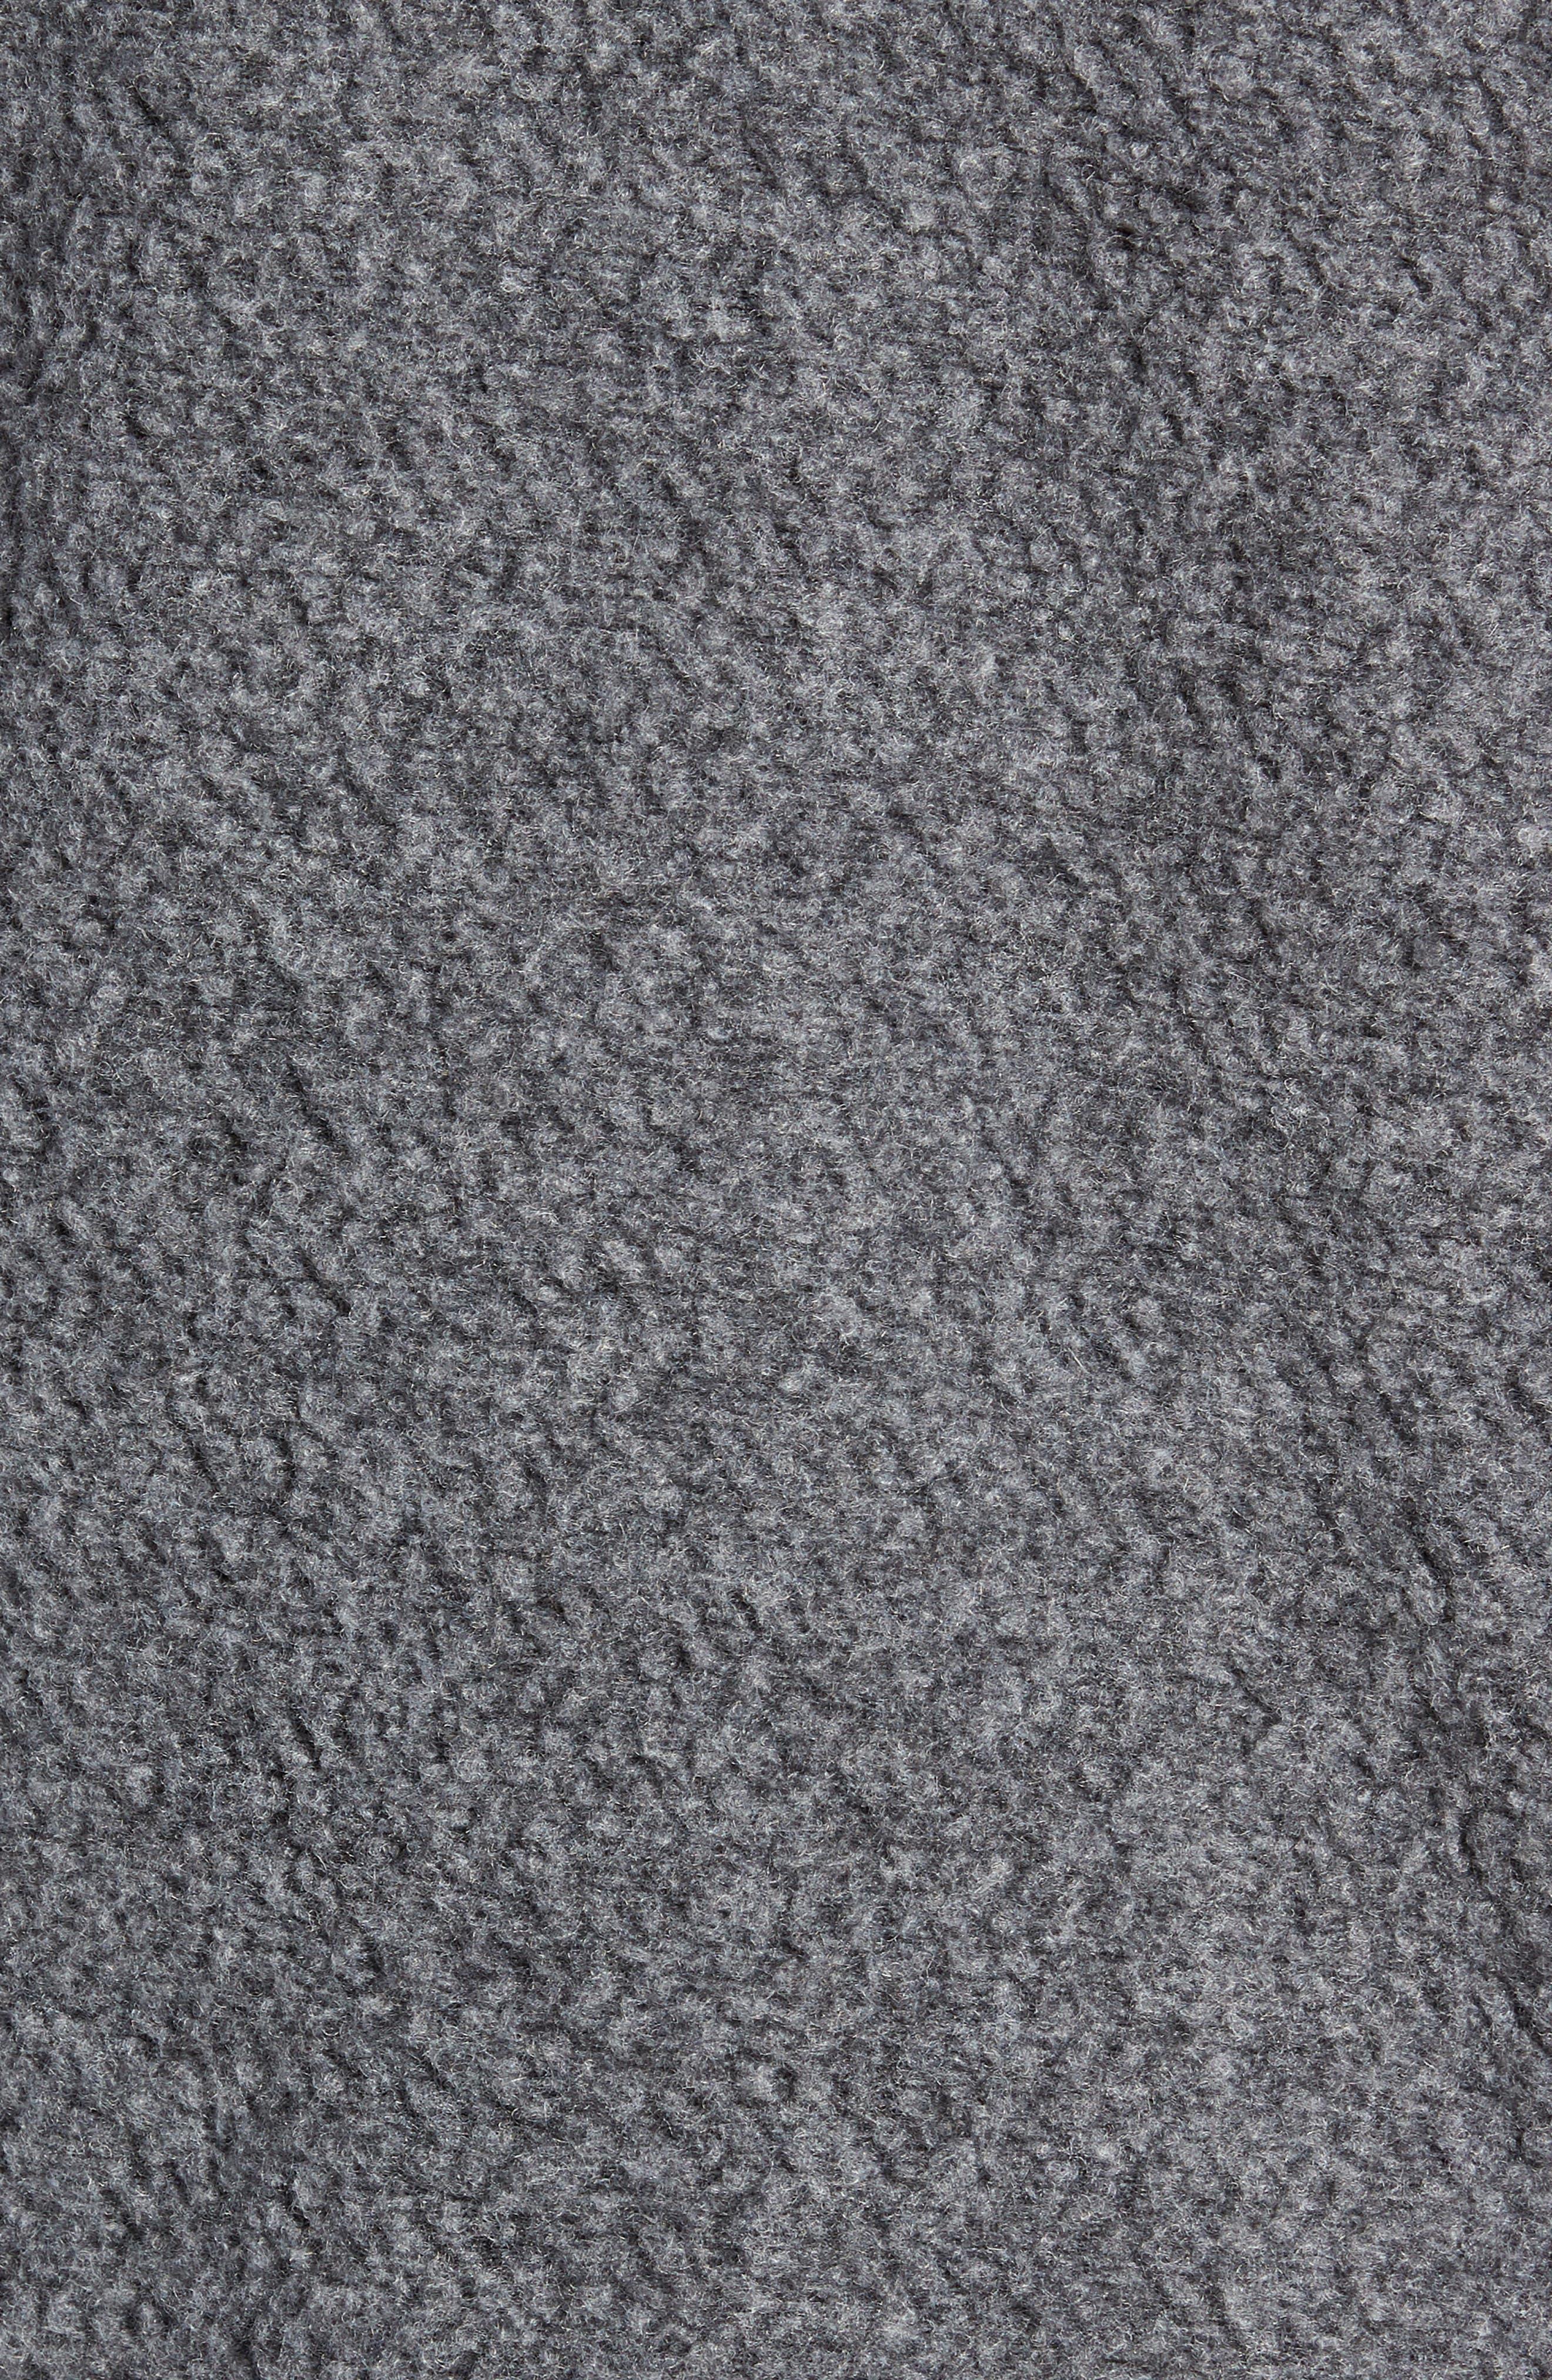 Woolyester Fleece Jacket,                             Alternate thumbnail 6, color,                             FORGE GREY